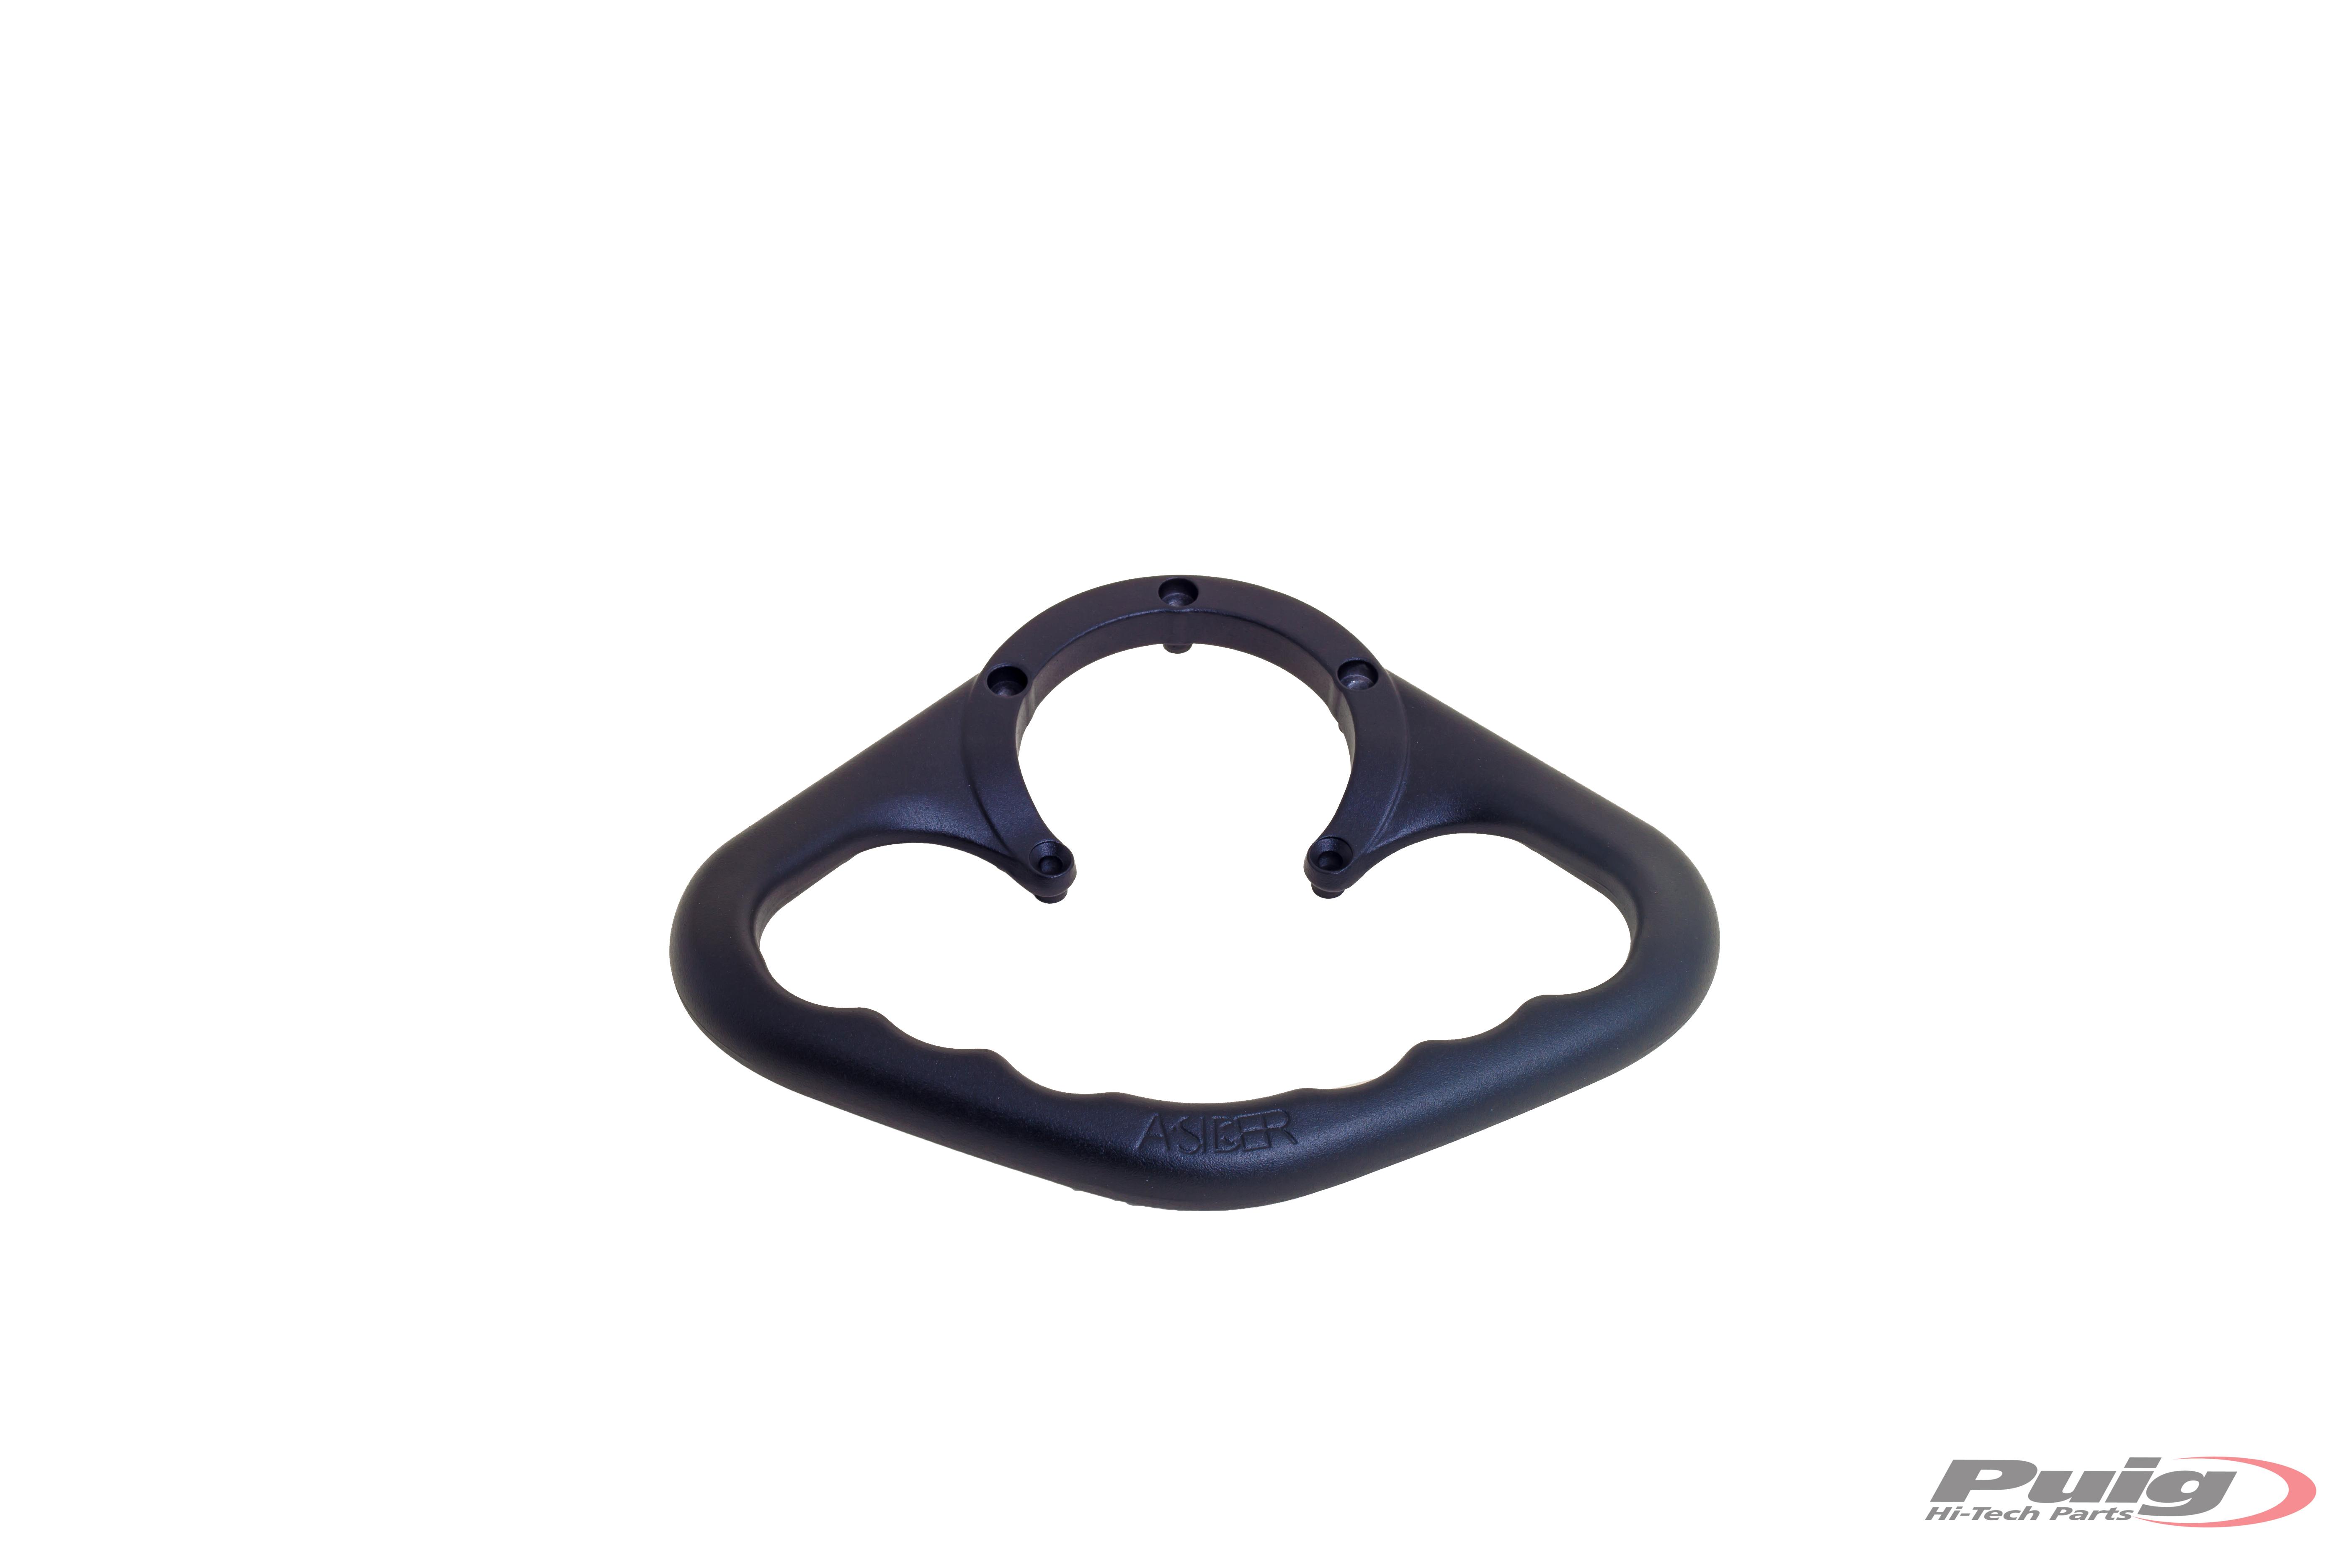 Asidero Puig 9036 para moto HONDA (Mirar modelos compatibles)